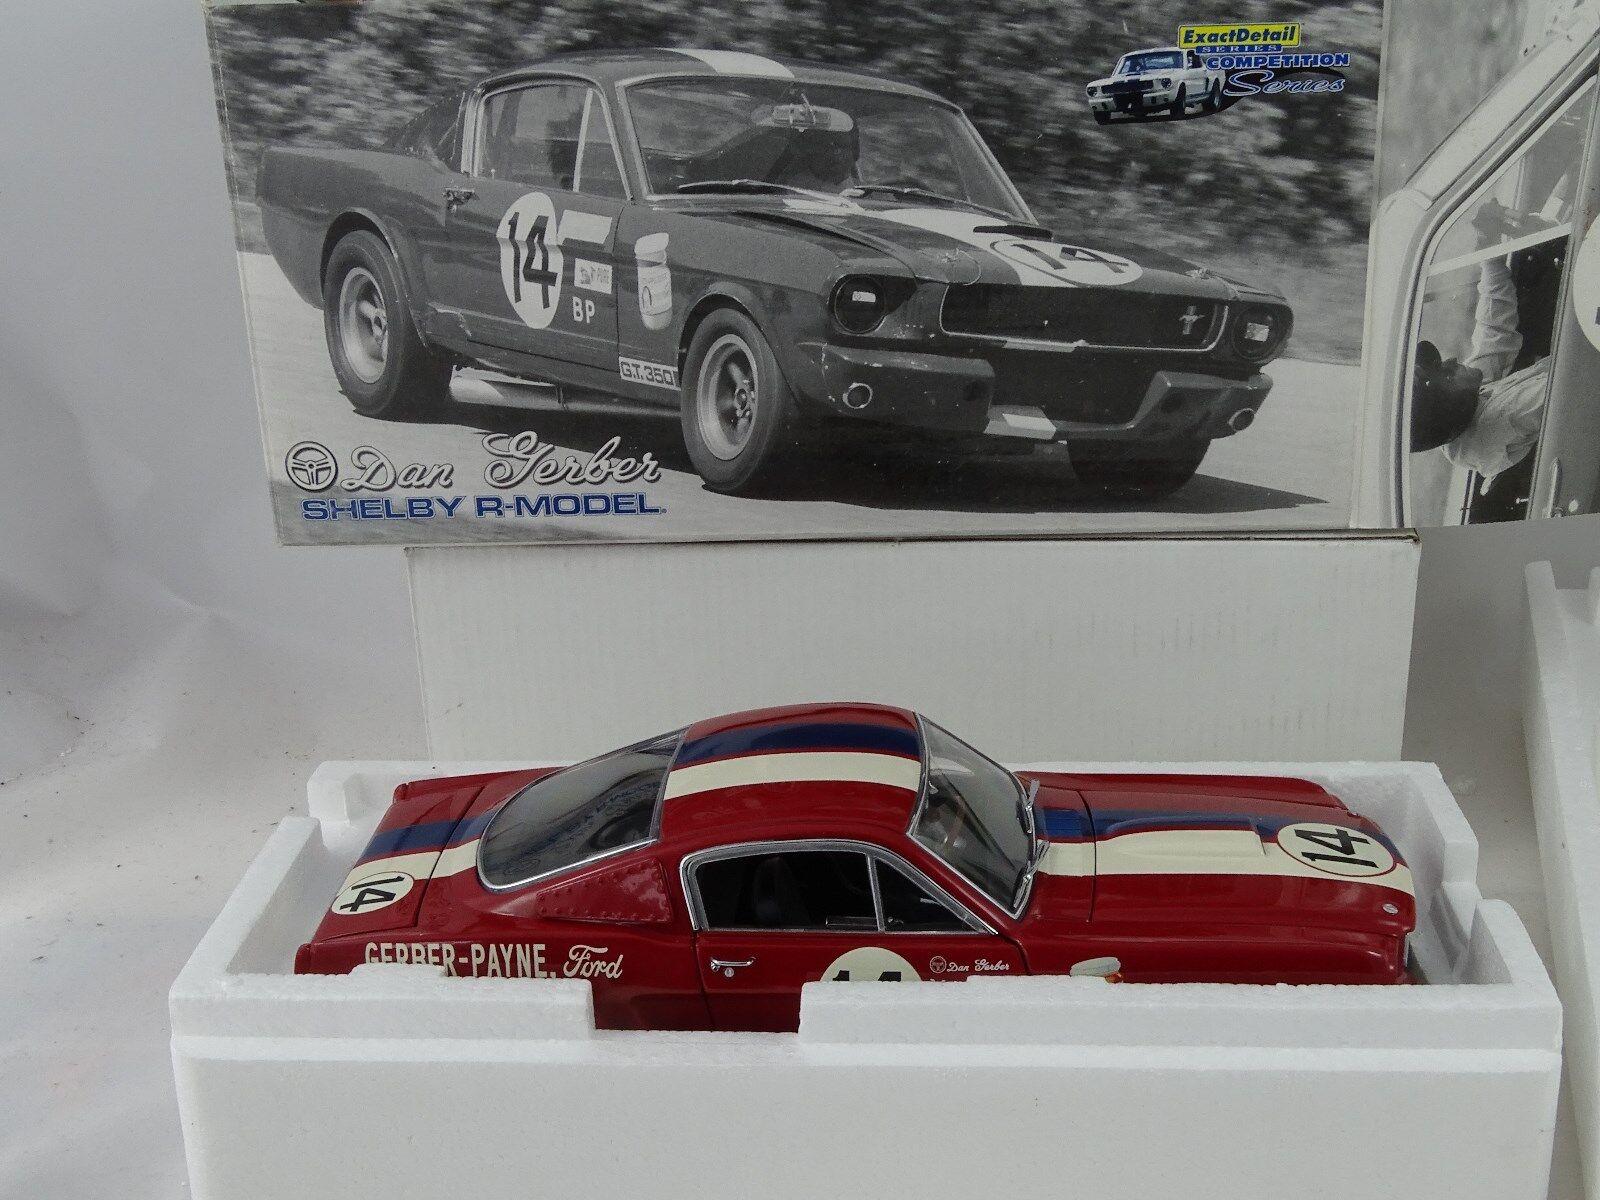 1:18 Esatto Dettaglio - 1966 Shelby G.T.350 Dan Gerber  14 Lmtd.1of 2250